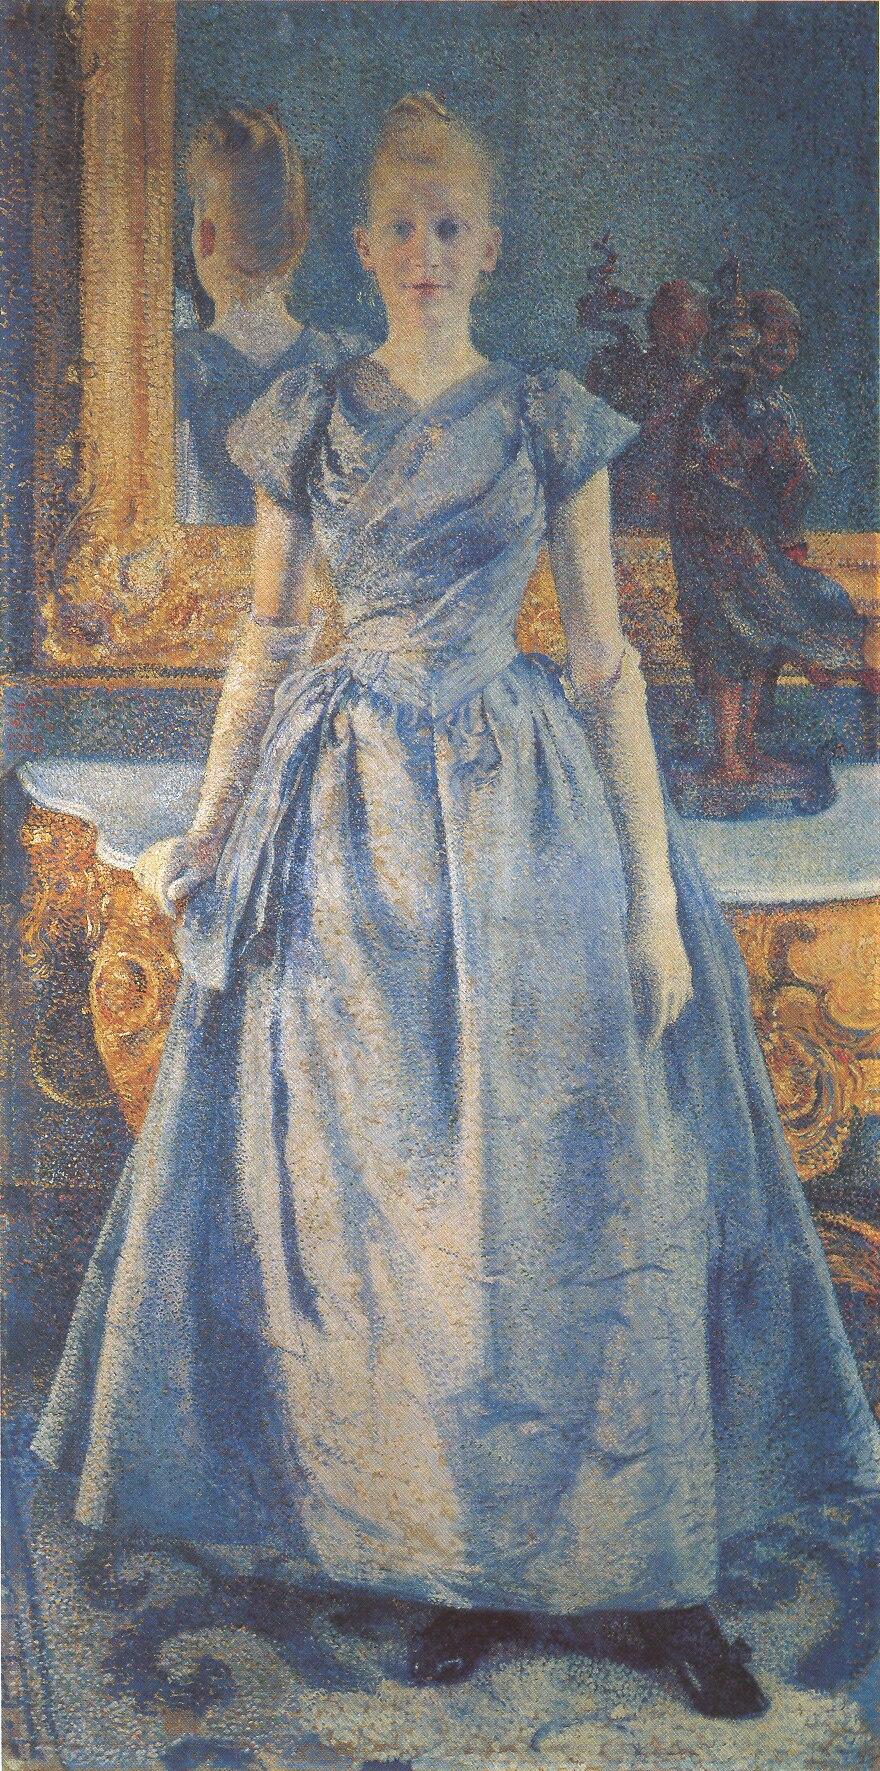 Portrait-Alice-Sethe-1888